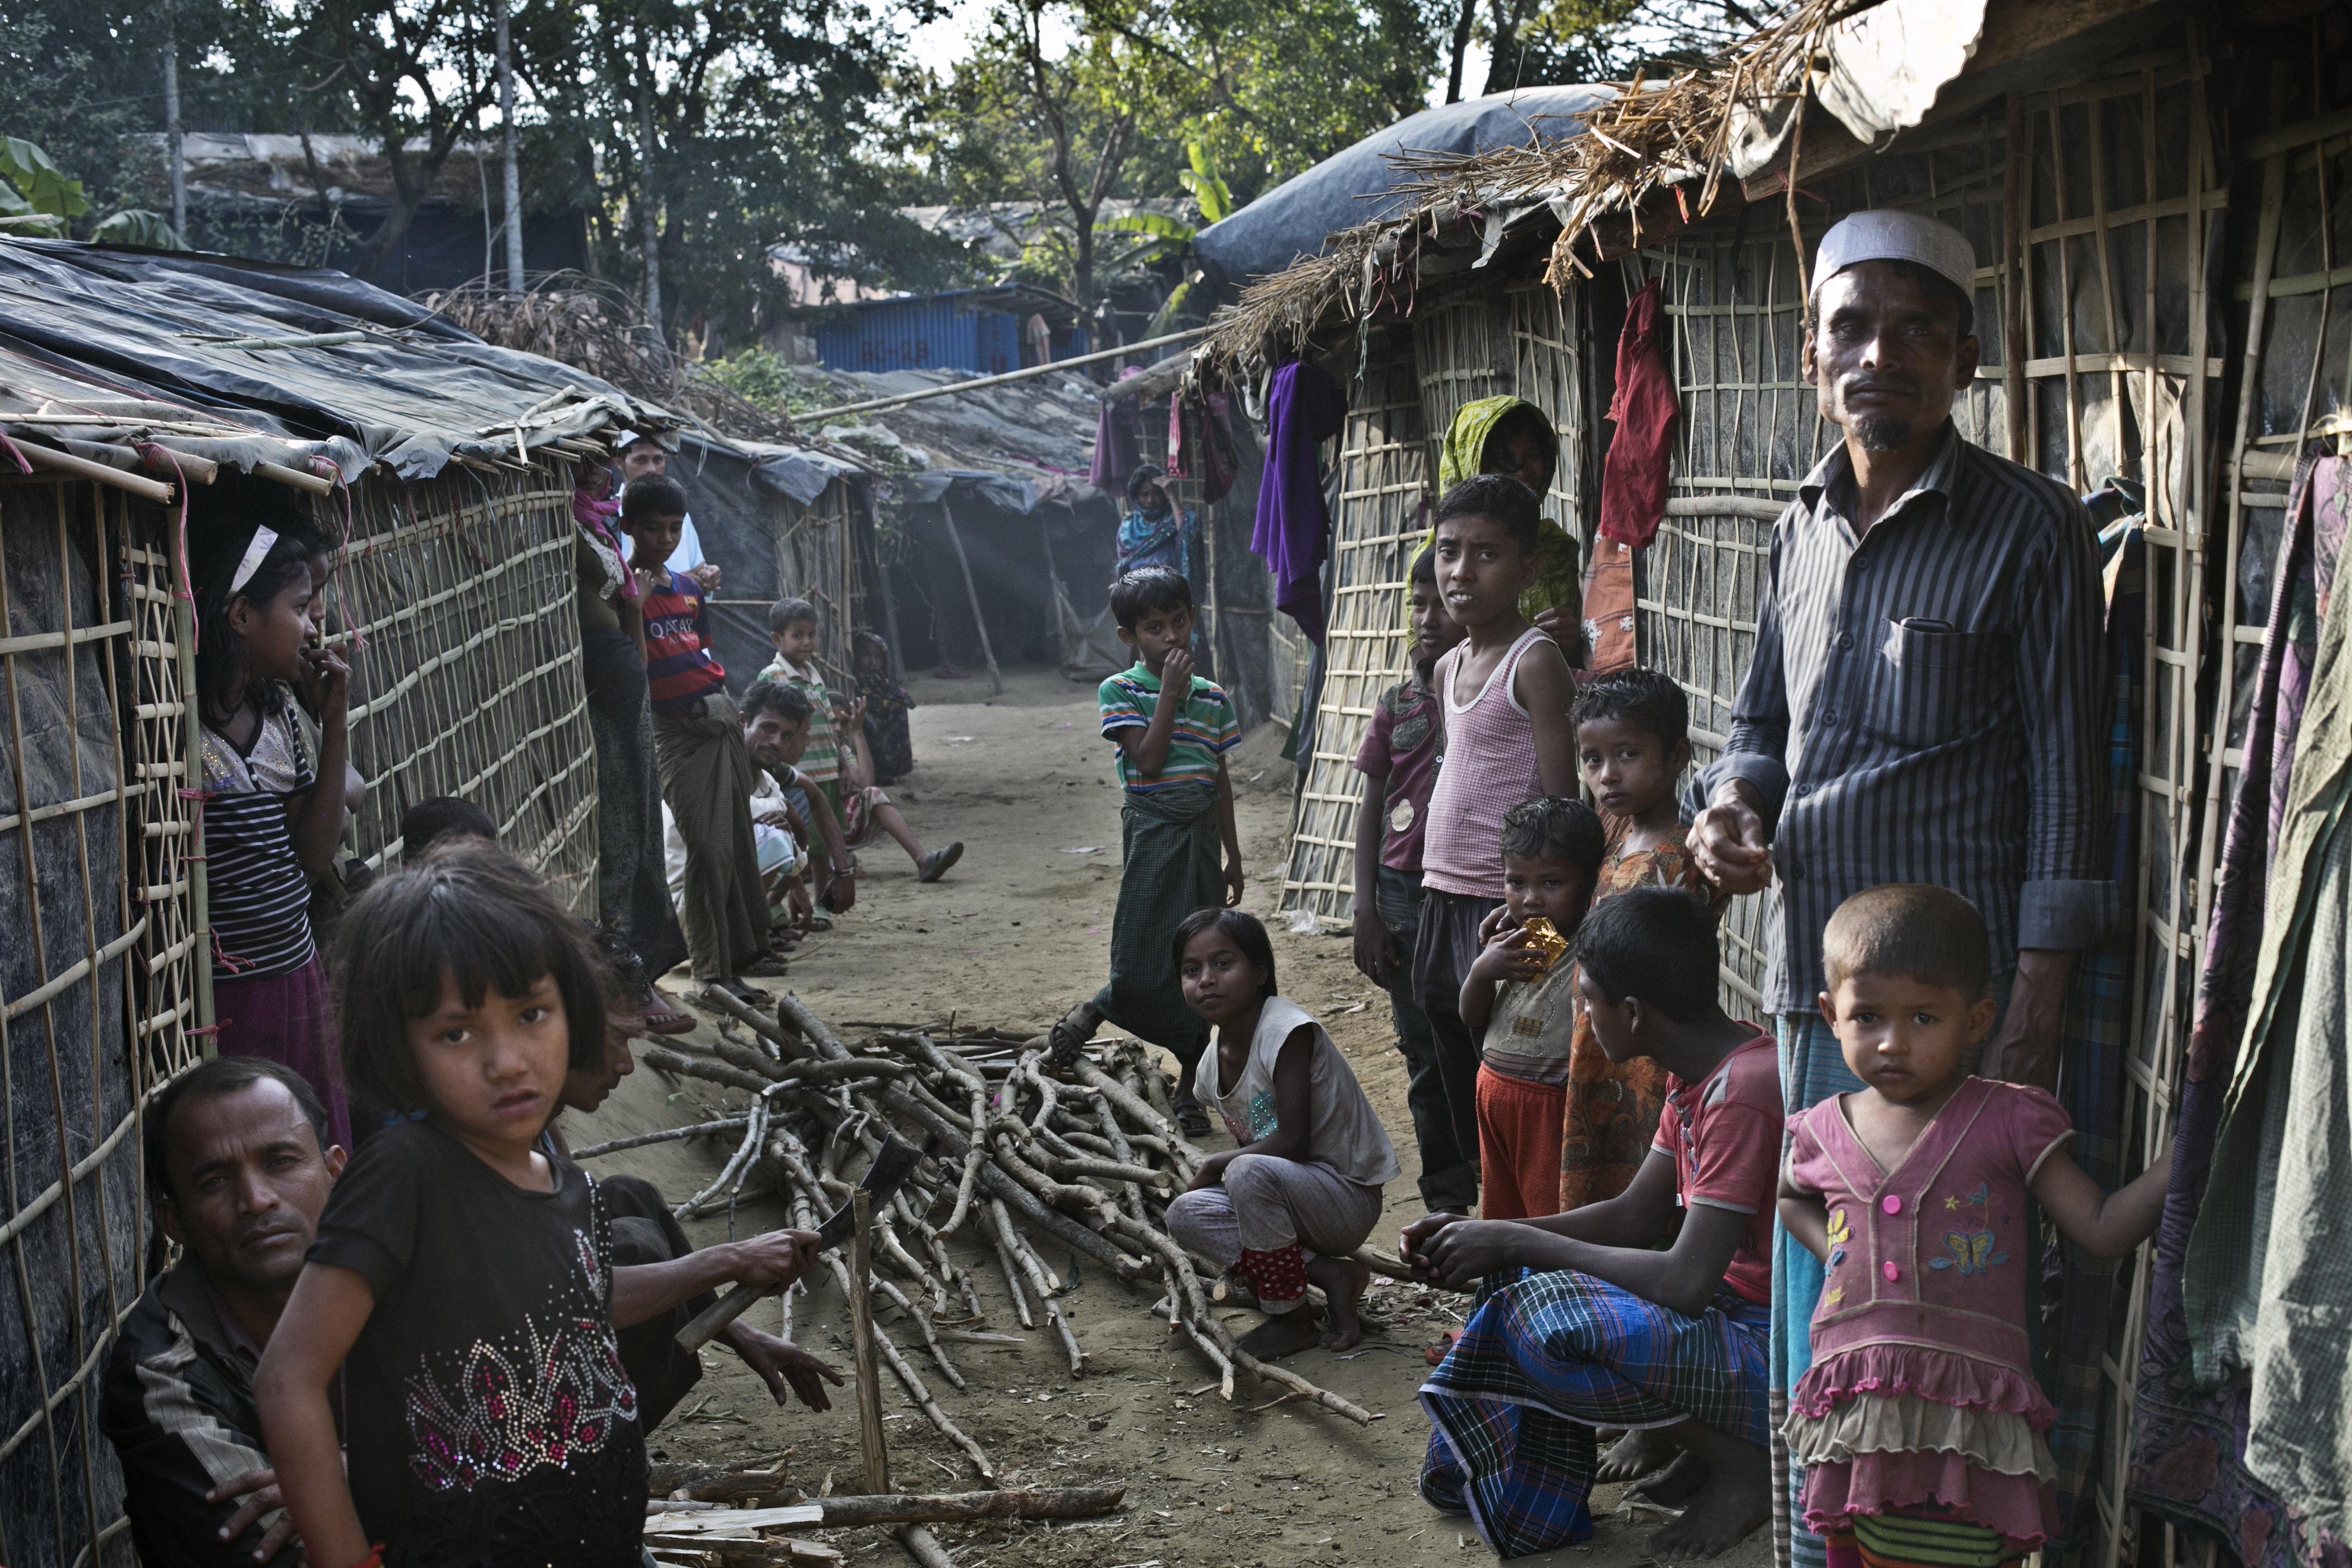 Rohingyas at a refugee camp in Bangladesh on Jan. 20, 2017.